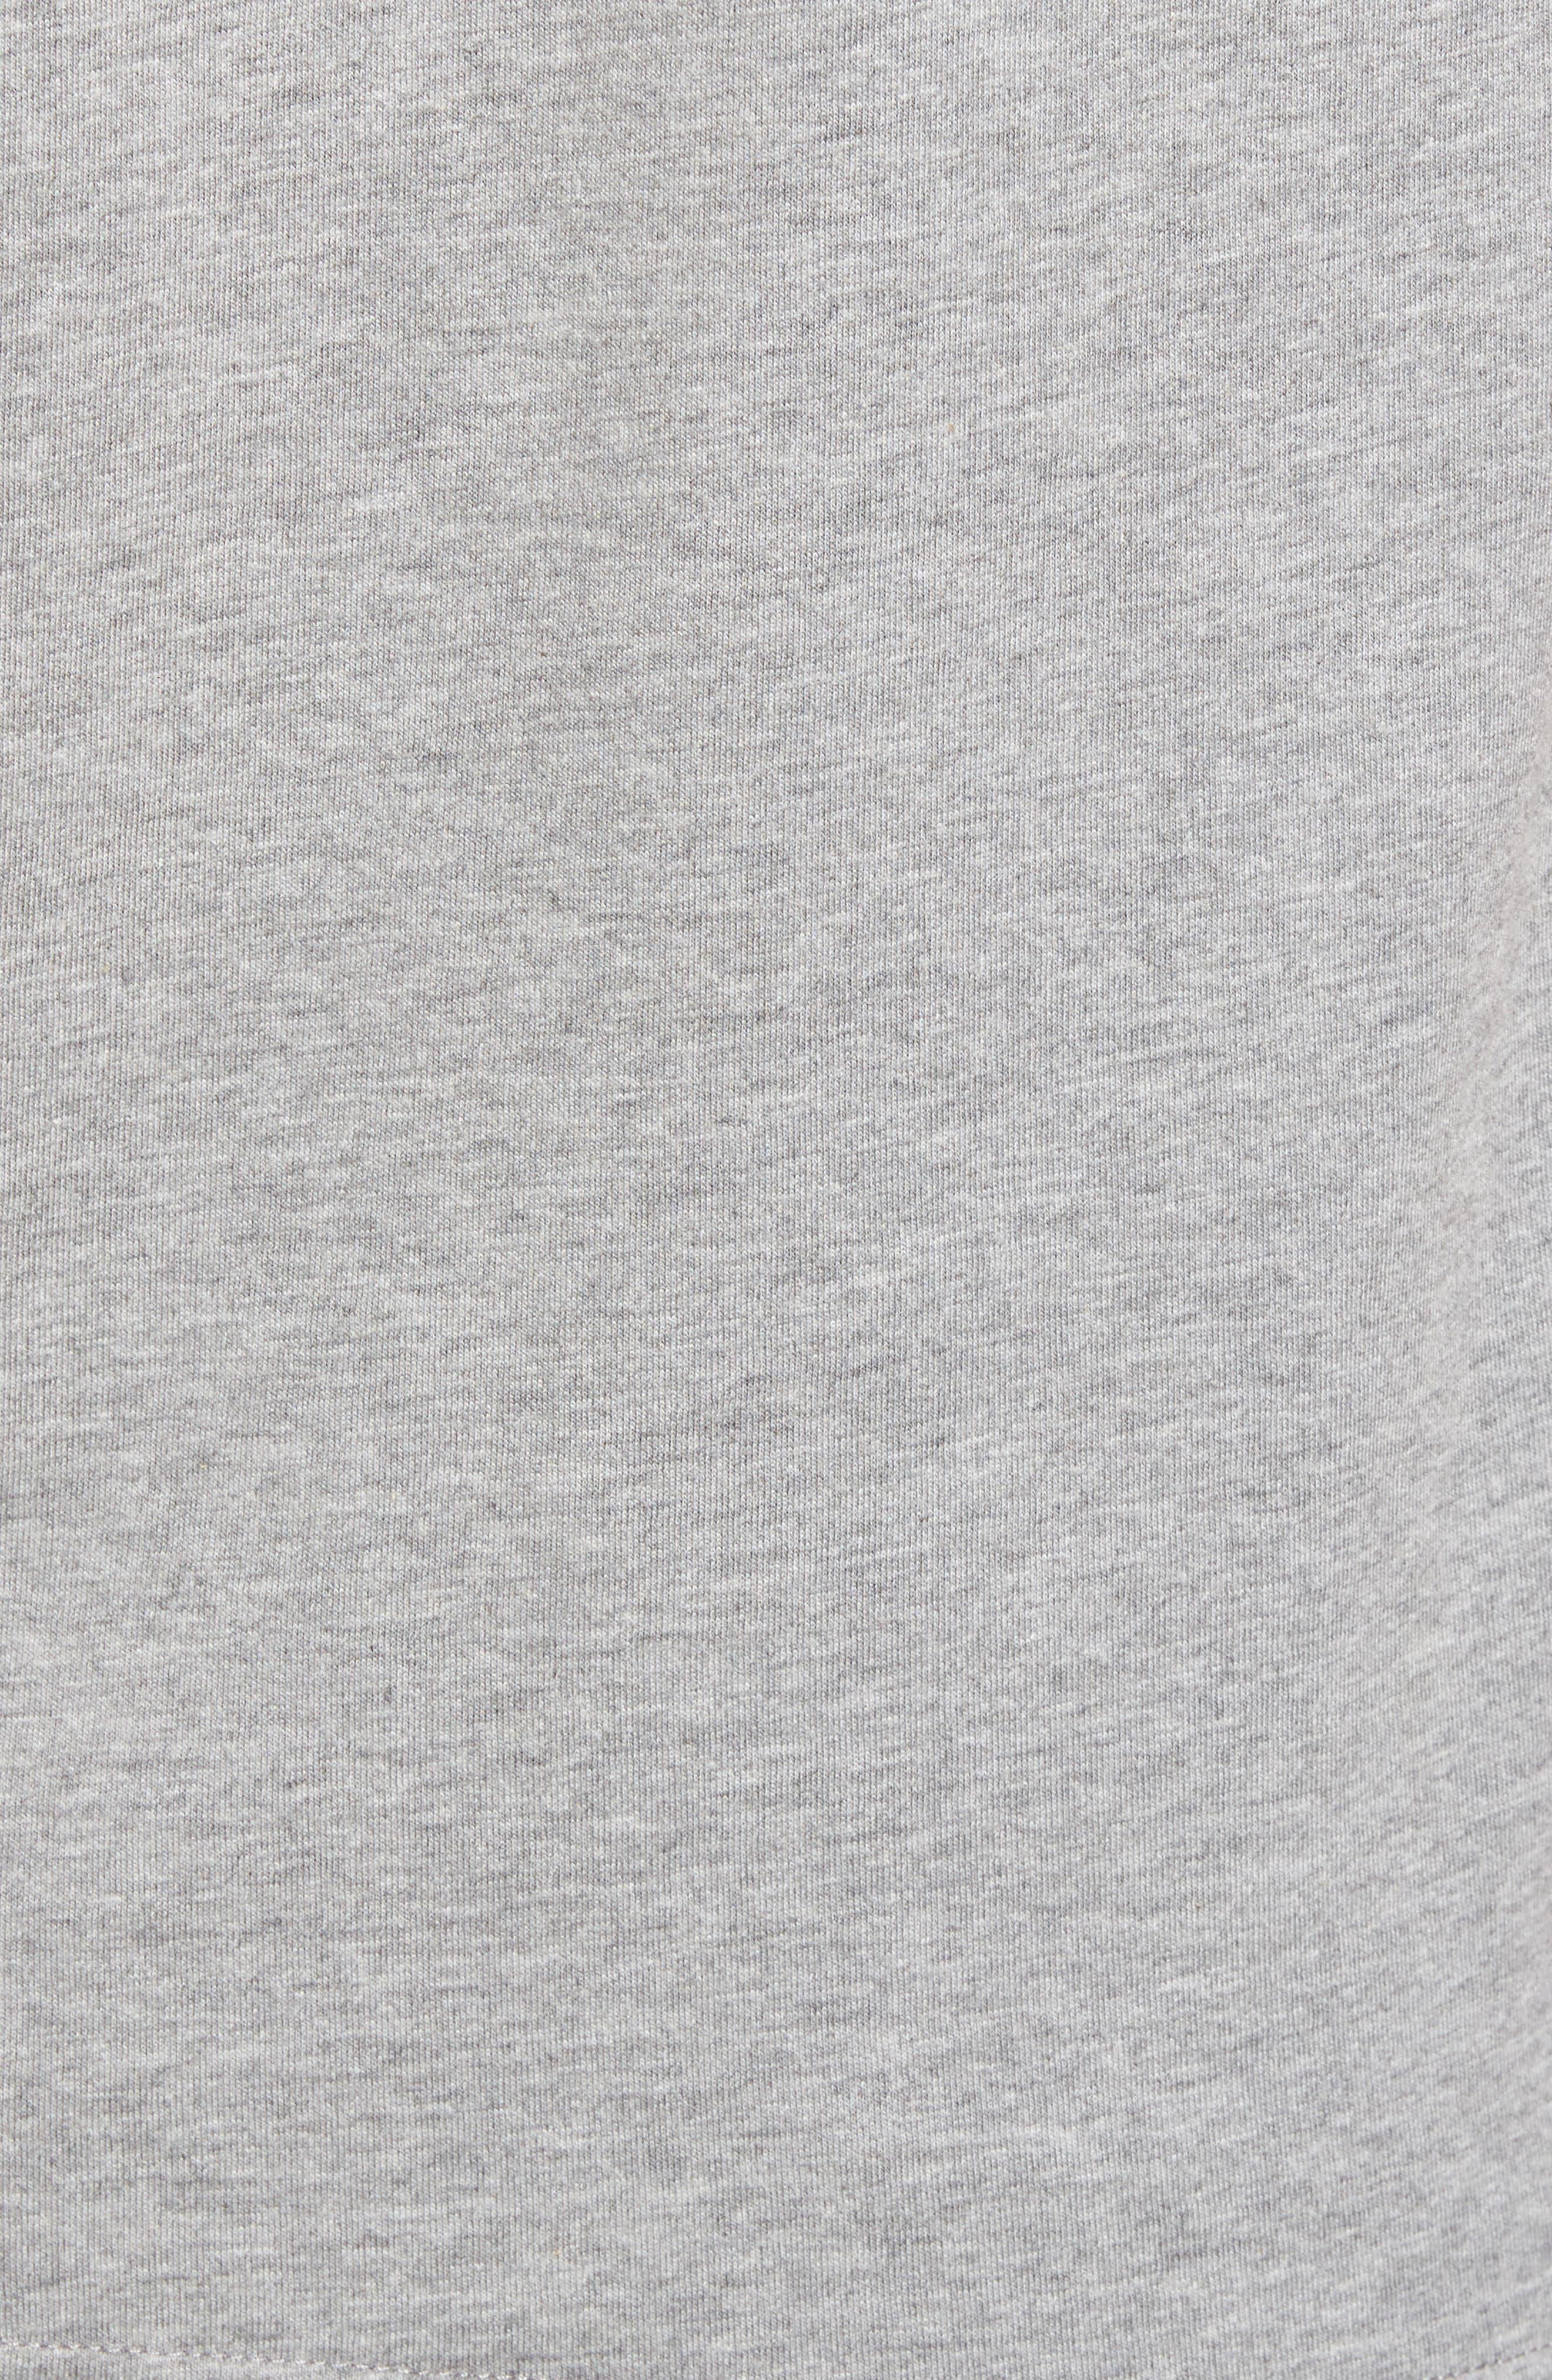 Morning Anchor Graphic T-Shirt,                             Alternate thumbnail 5, color,                             020